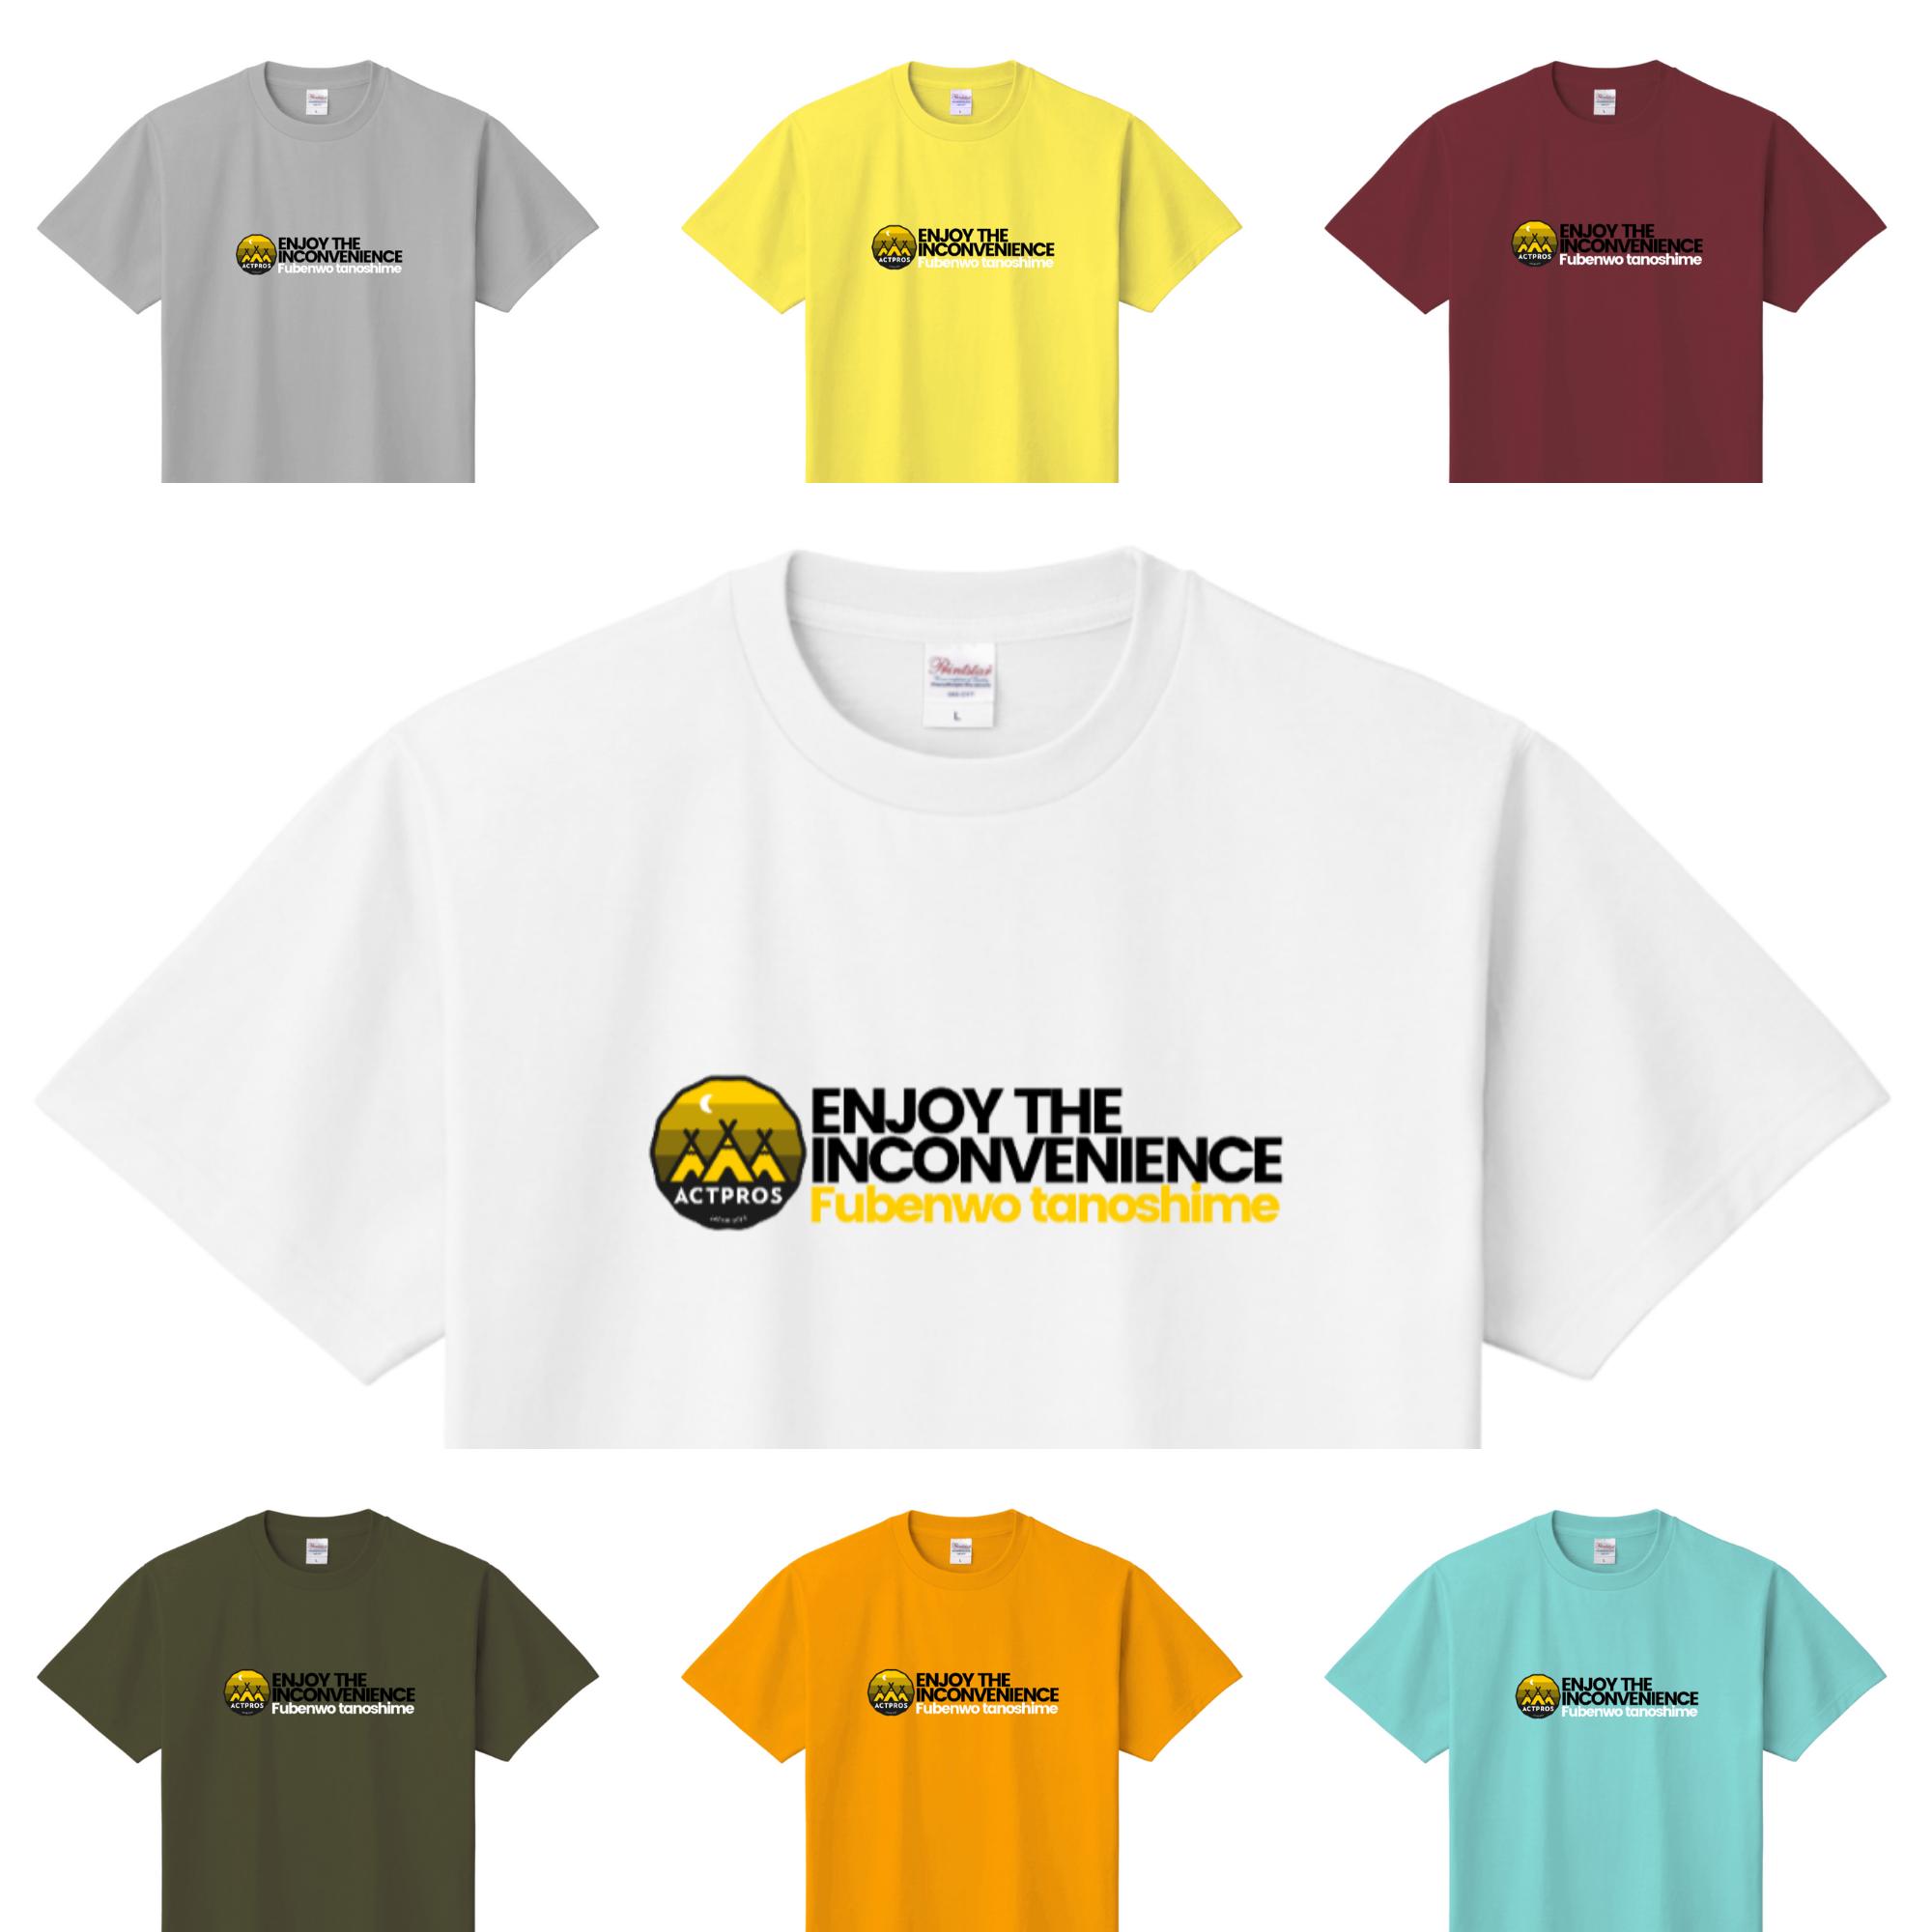 【UNISEX】ACTPROS ENJOY THE INCONVENIENCE 5.6oz ヘビーウェイトTEE【7colors】ACT-202102